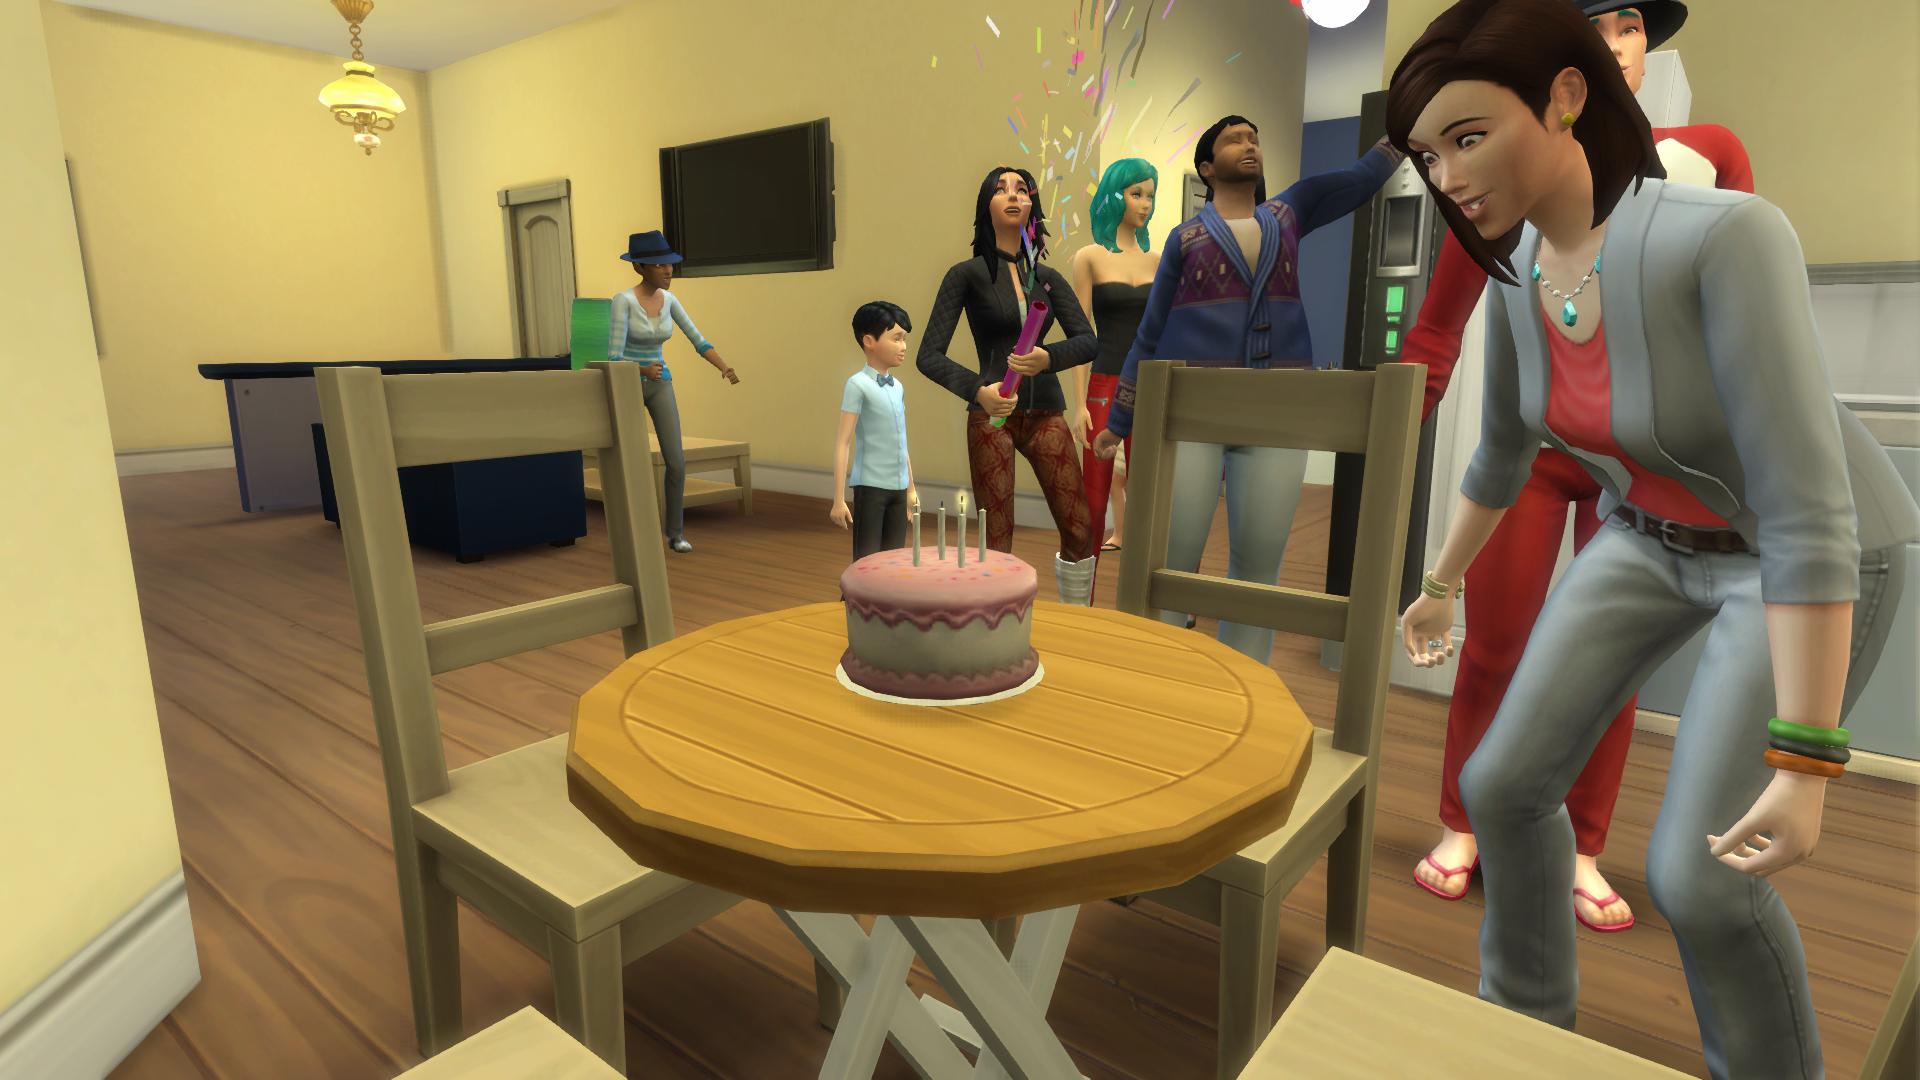 Marvelous Birthday Cake The Sims Wiki Fandom Funny Birthday Cards Online Hetedamsfinfo